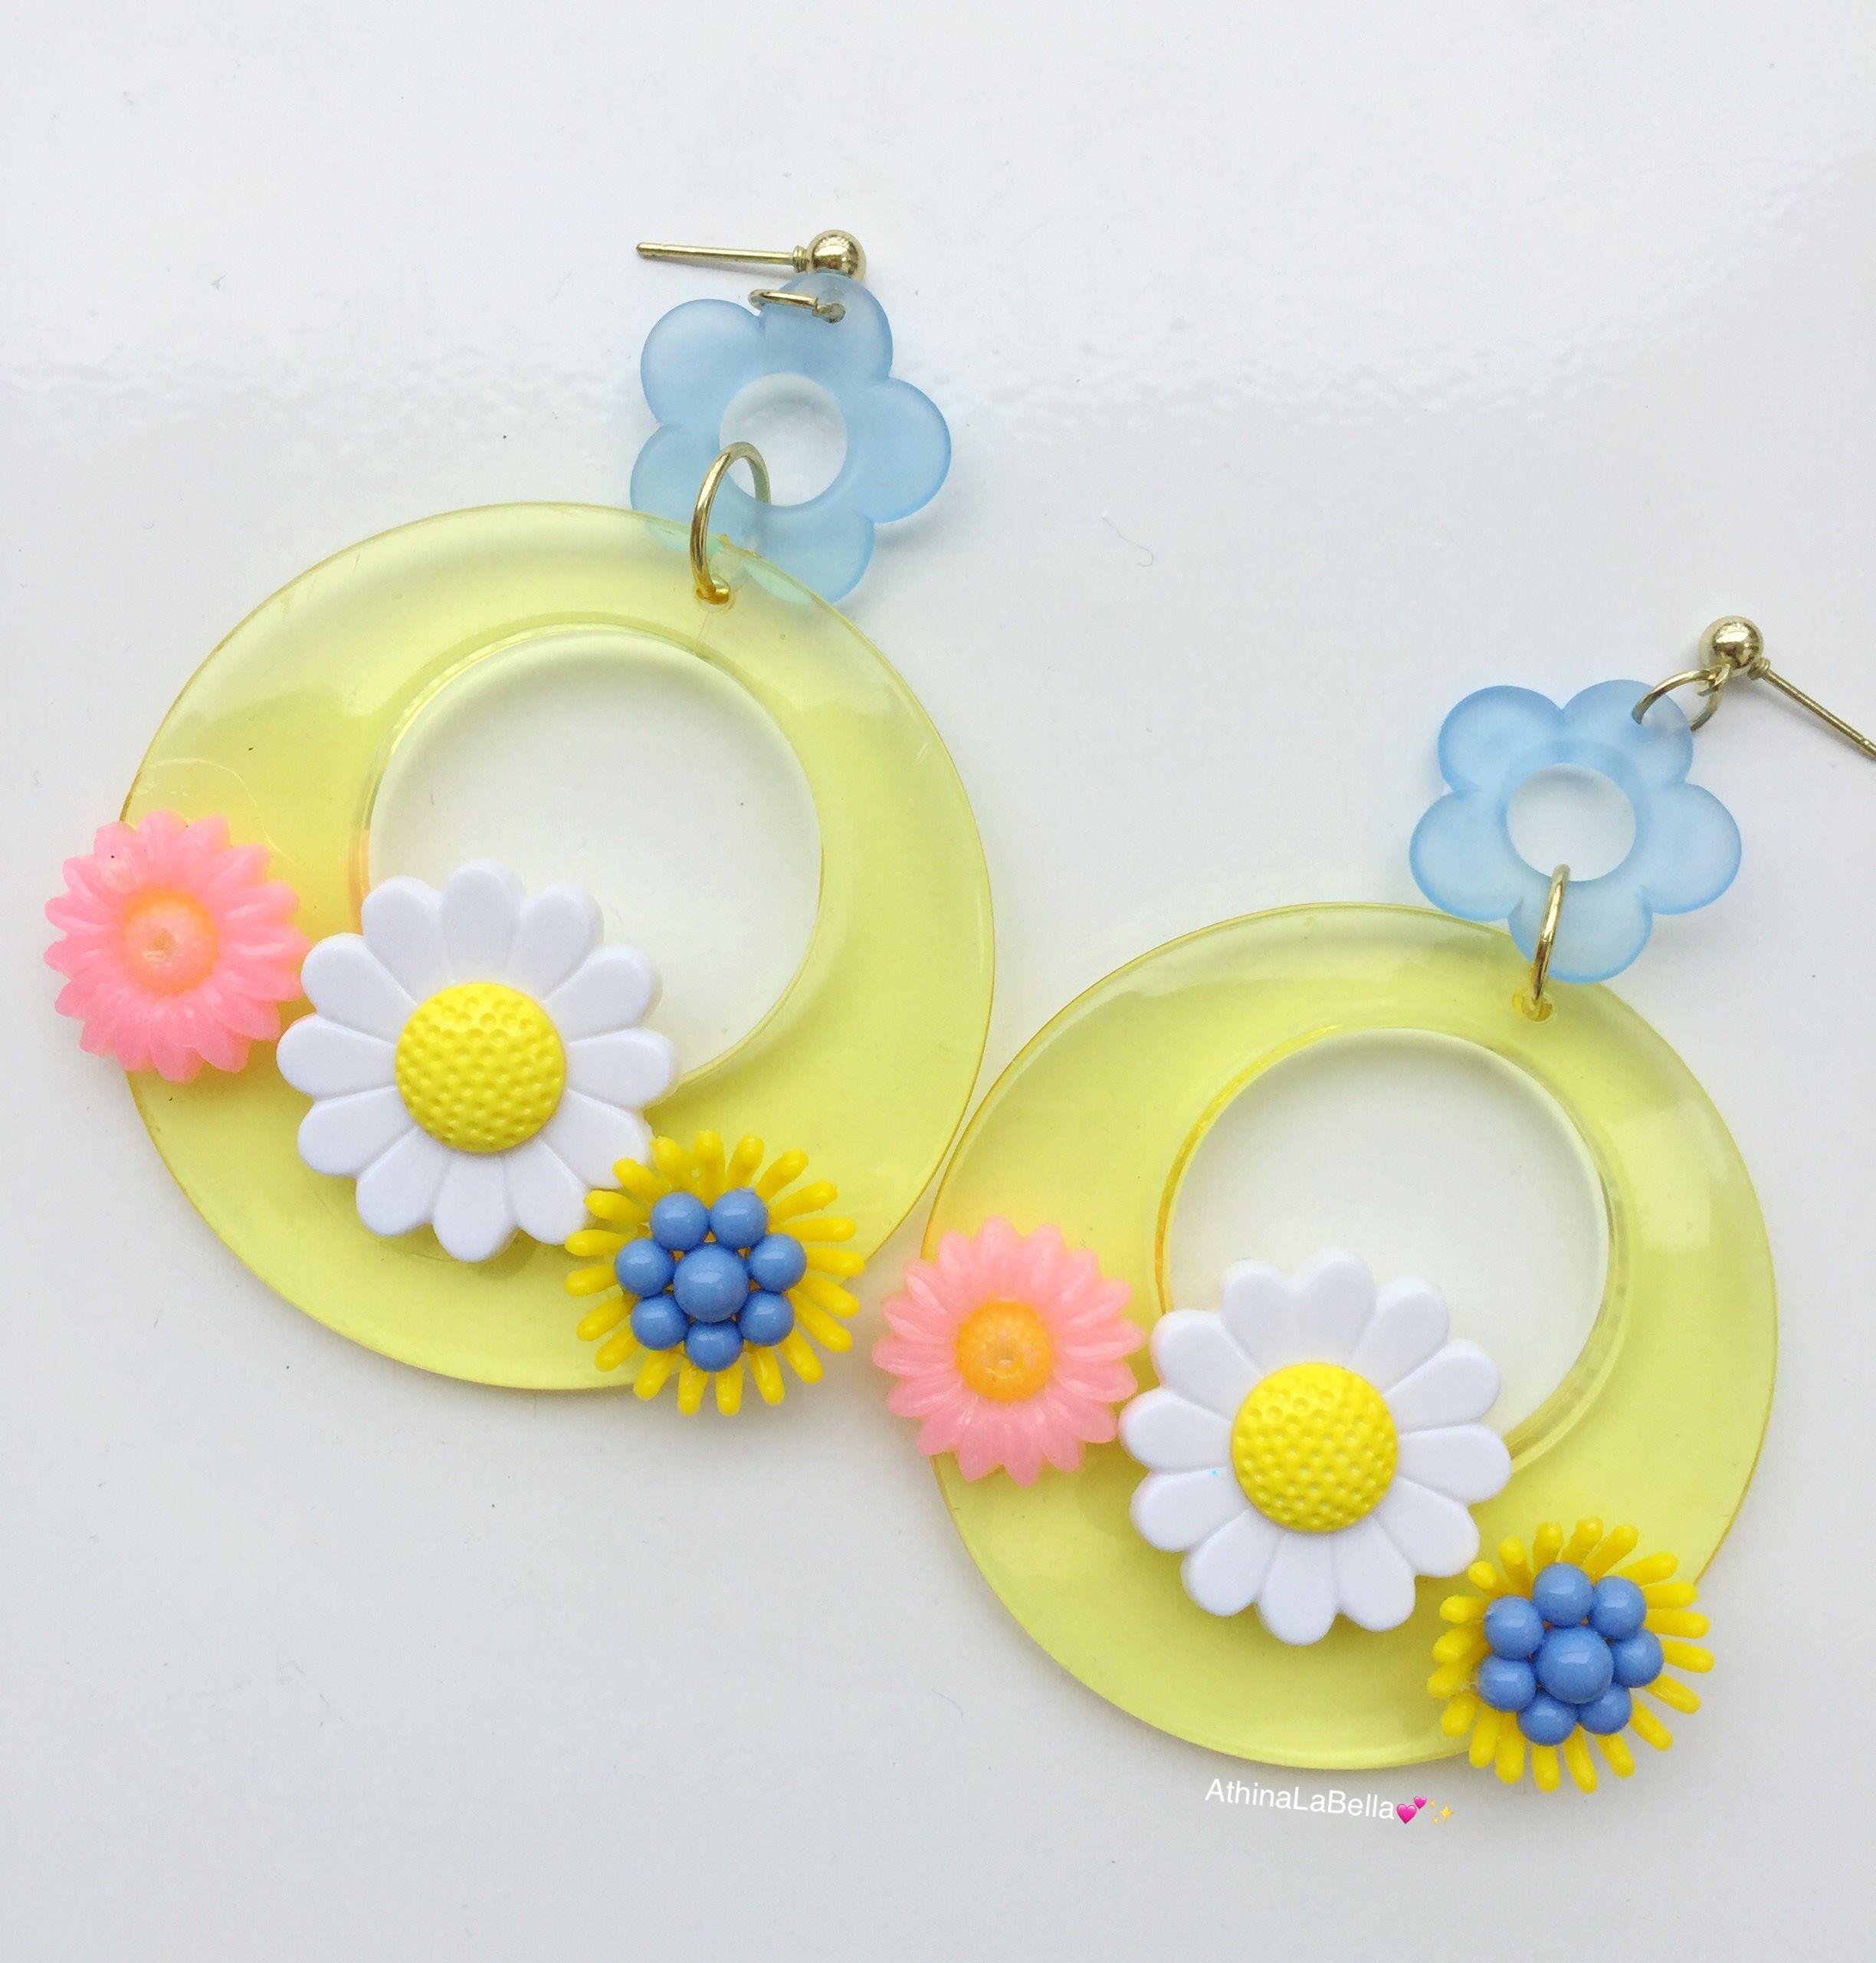 1960s daisy earrings clip on earrings gold tone boho festival jewelry floral flower white retro vintage earrings mid century mothers day